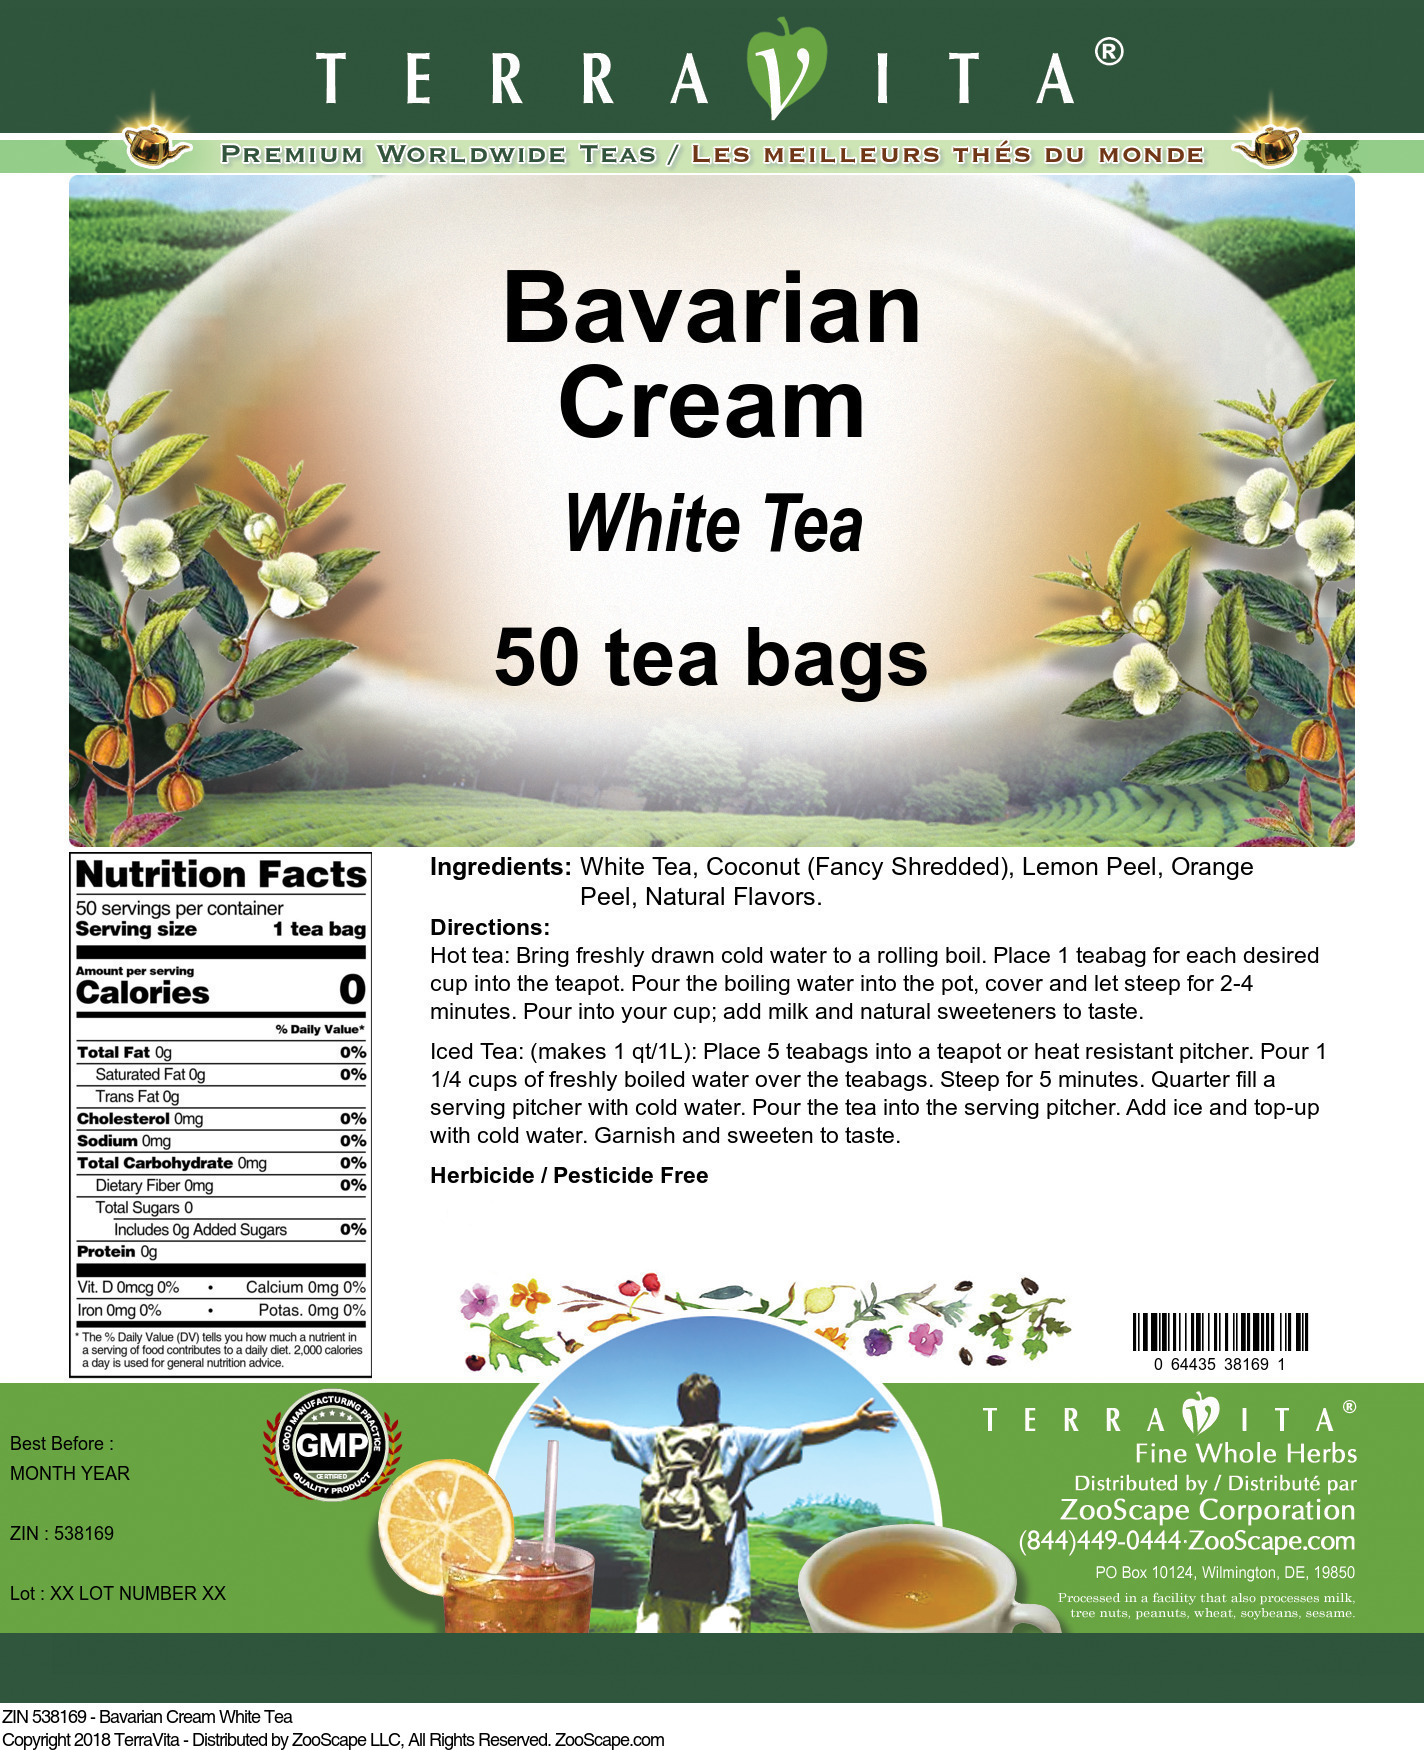 Bavarian Cream White Tea